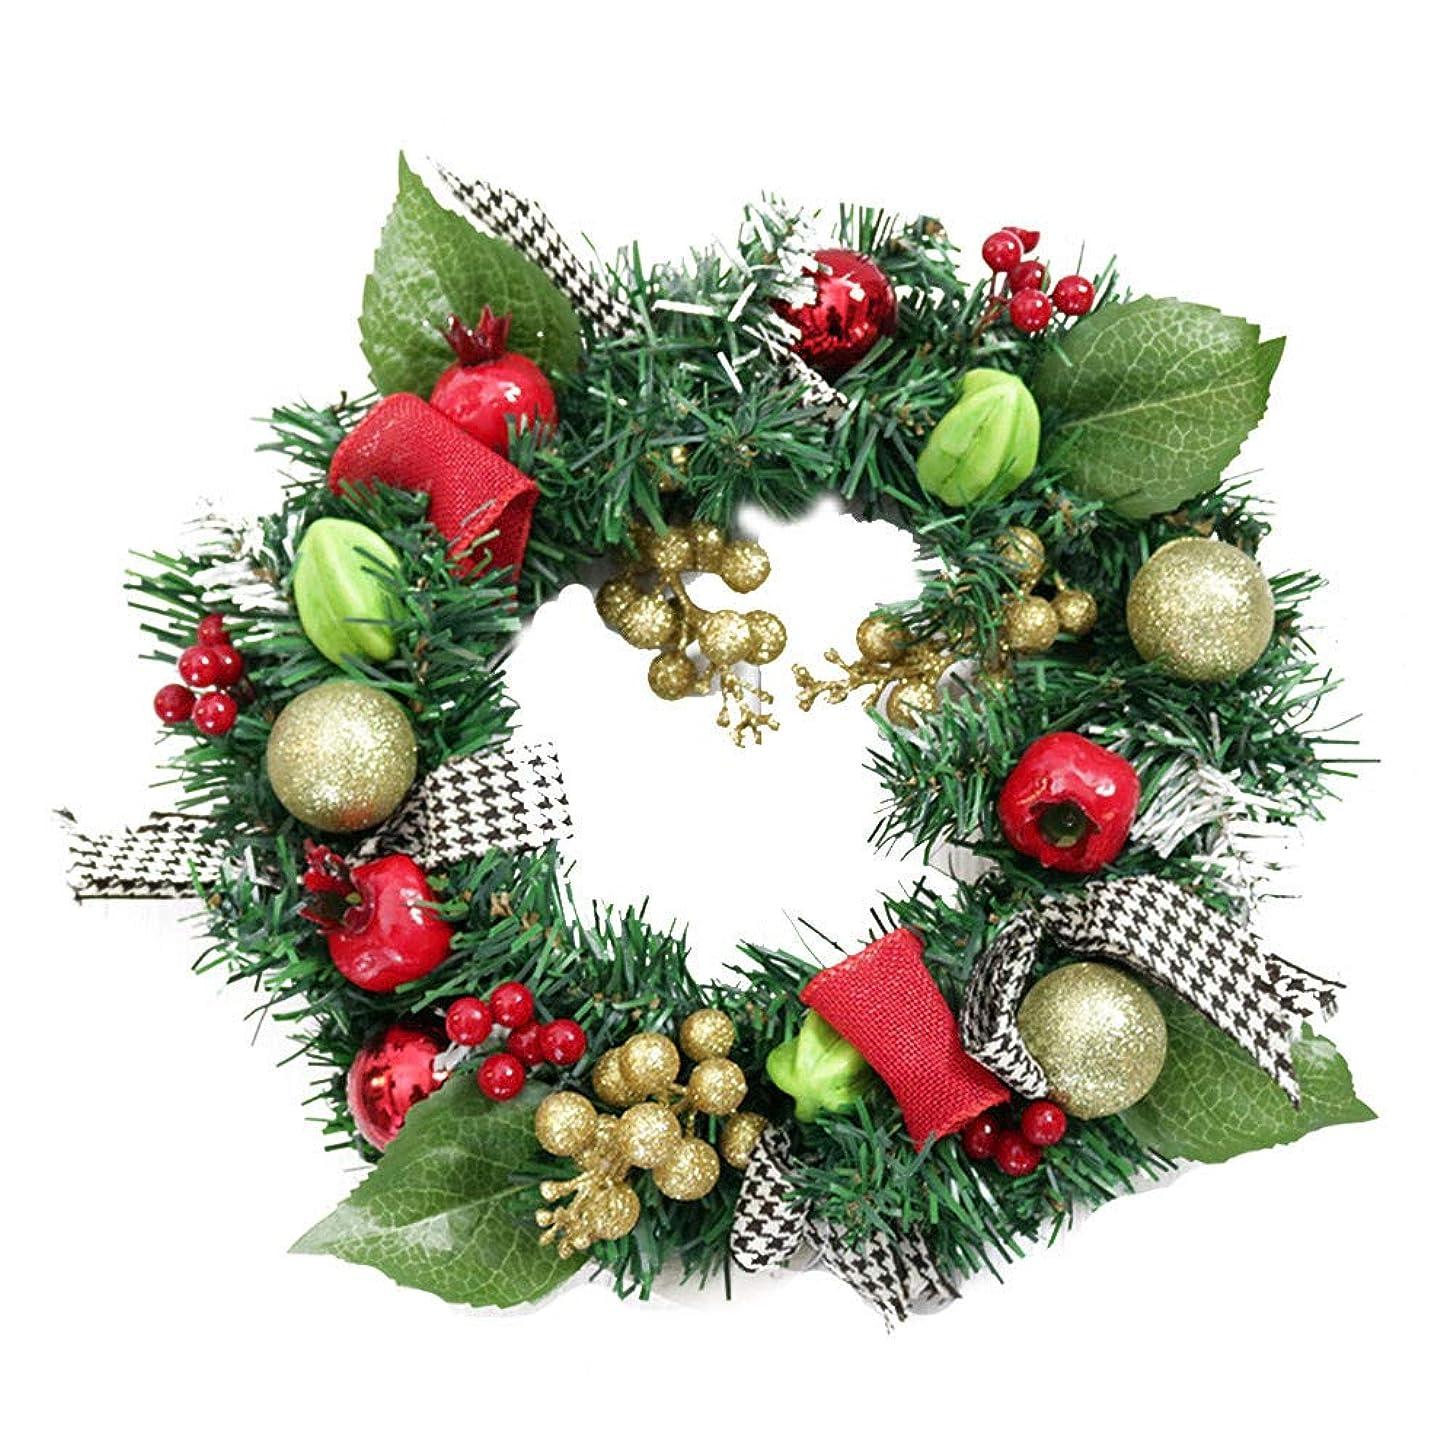 Christmas Wreath, Sacow 30cm Artificial Christmas Garland Berry Wreath Pine Cone Pendant Wall Decor Wreath (A)